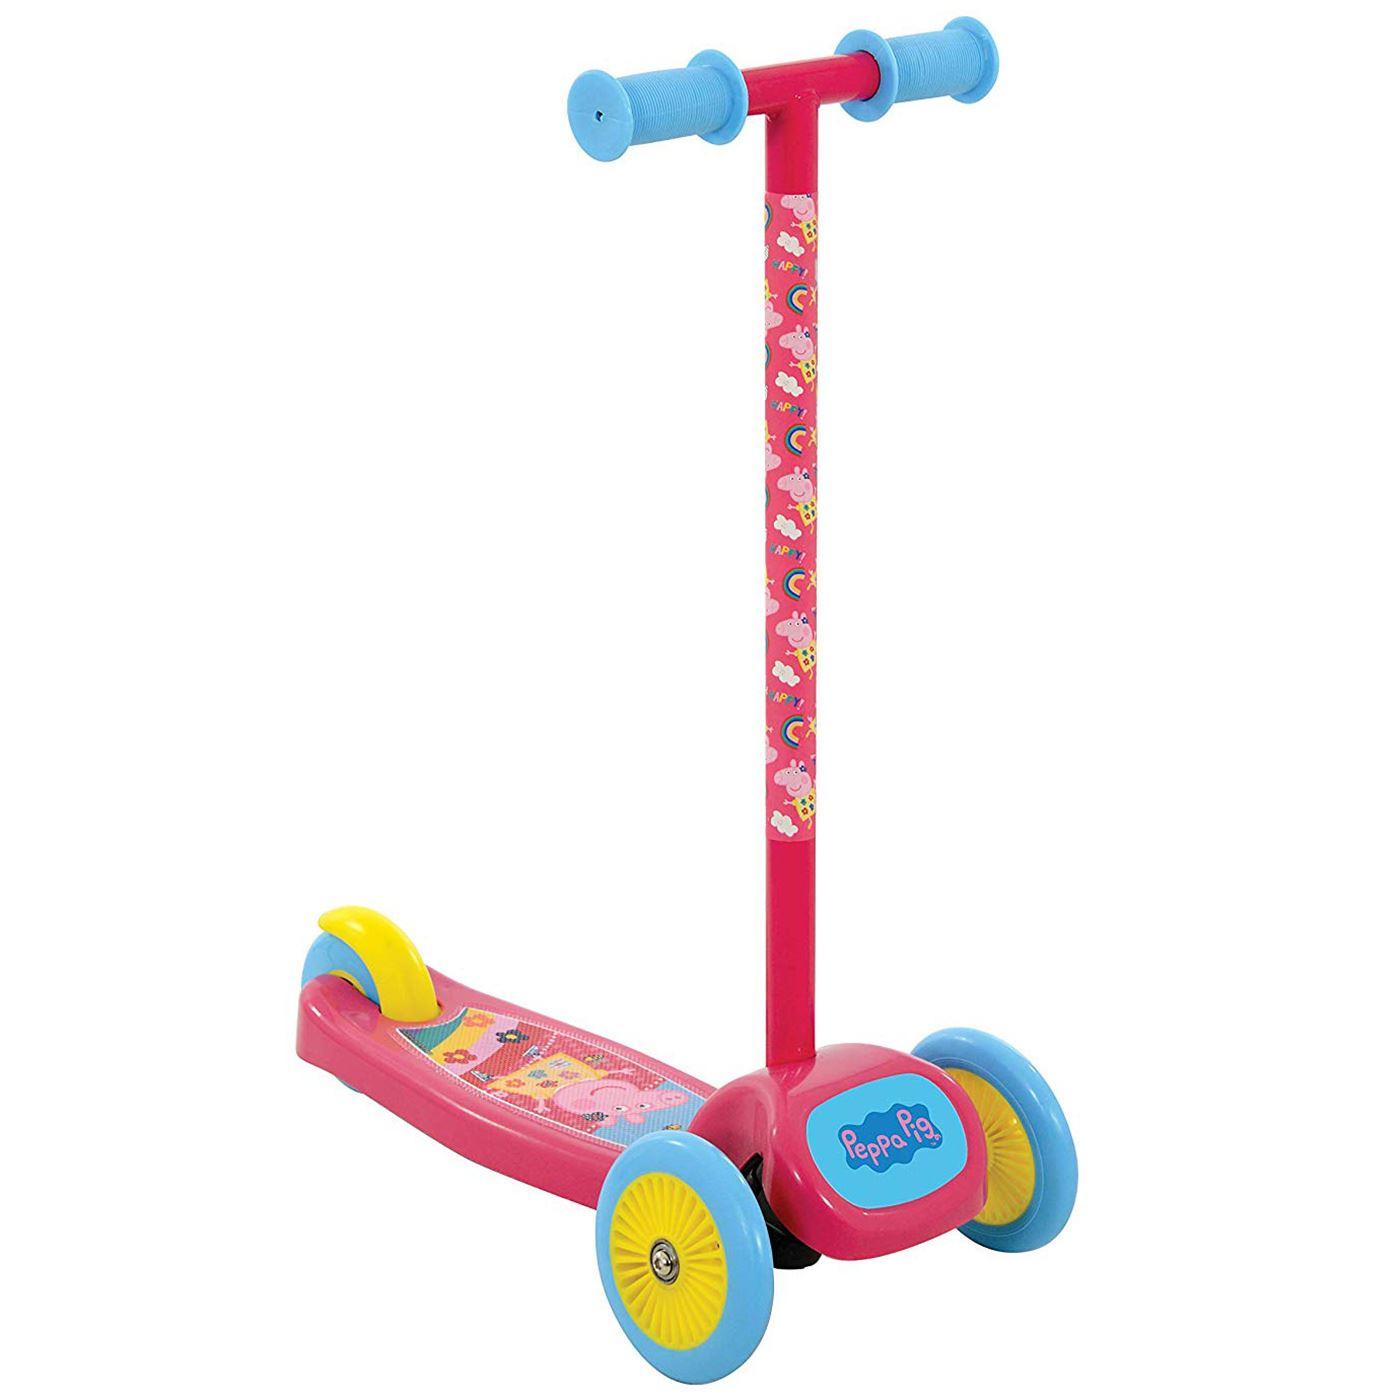 Peppa pig tilt n turn scooter with 3 wide wheels kids girls